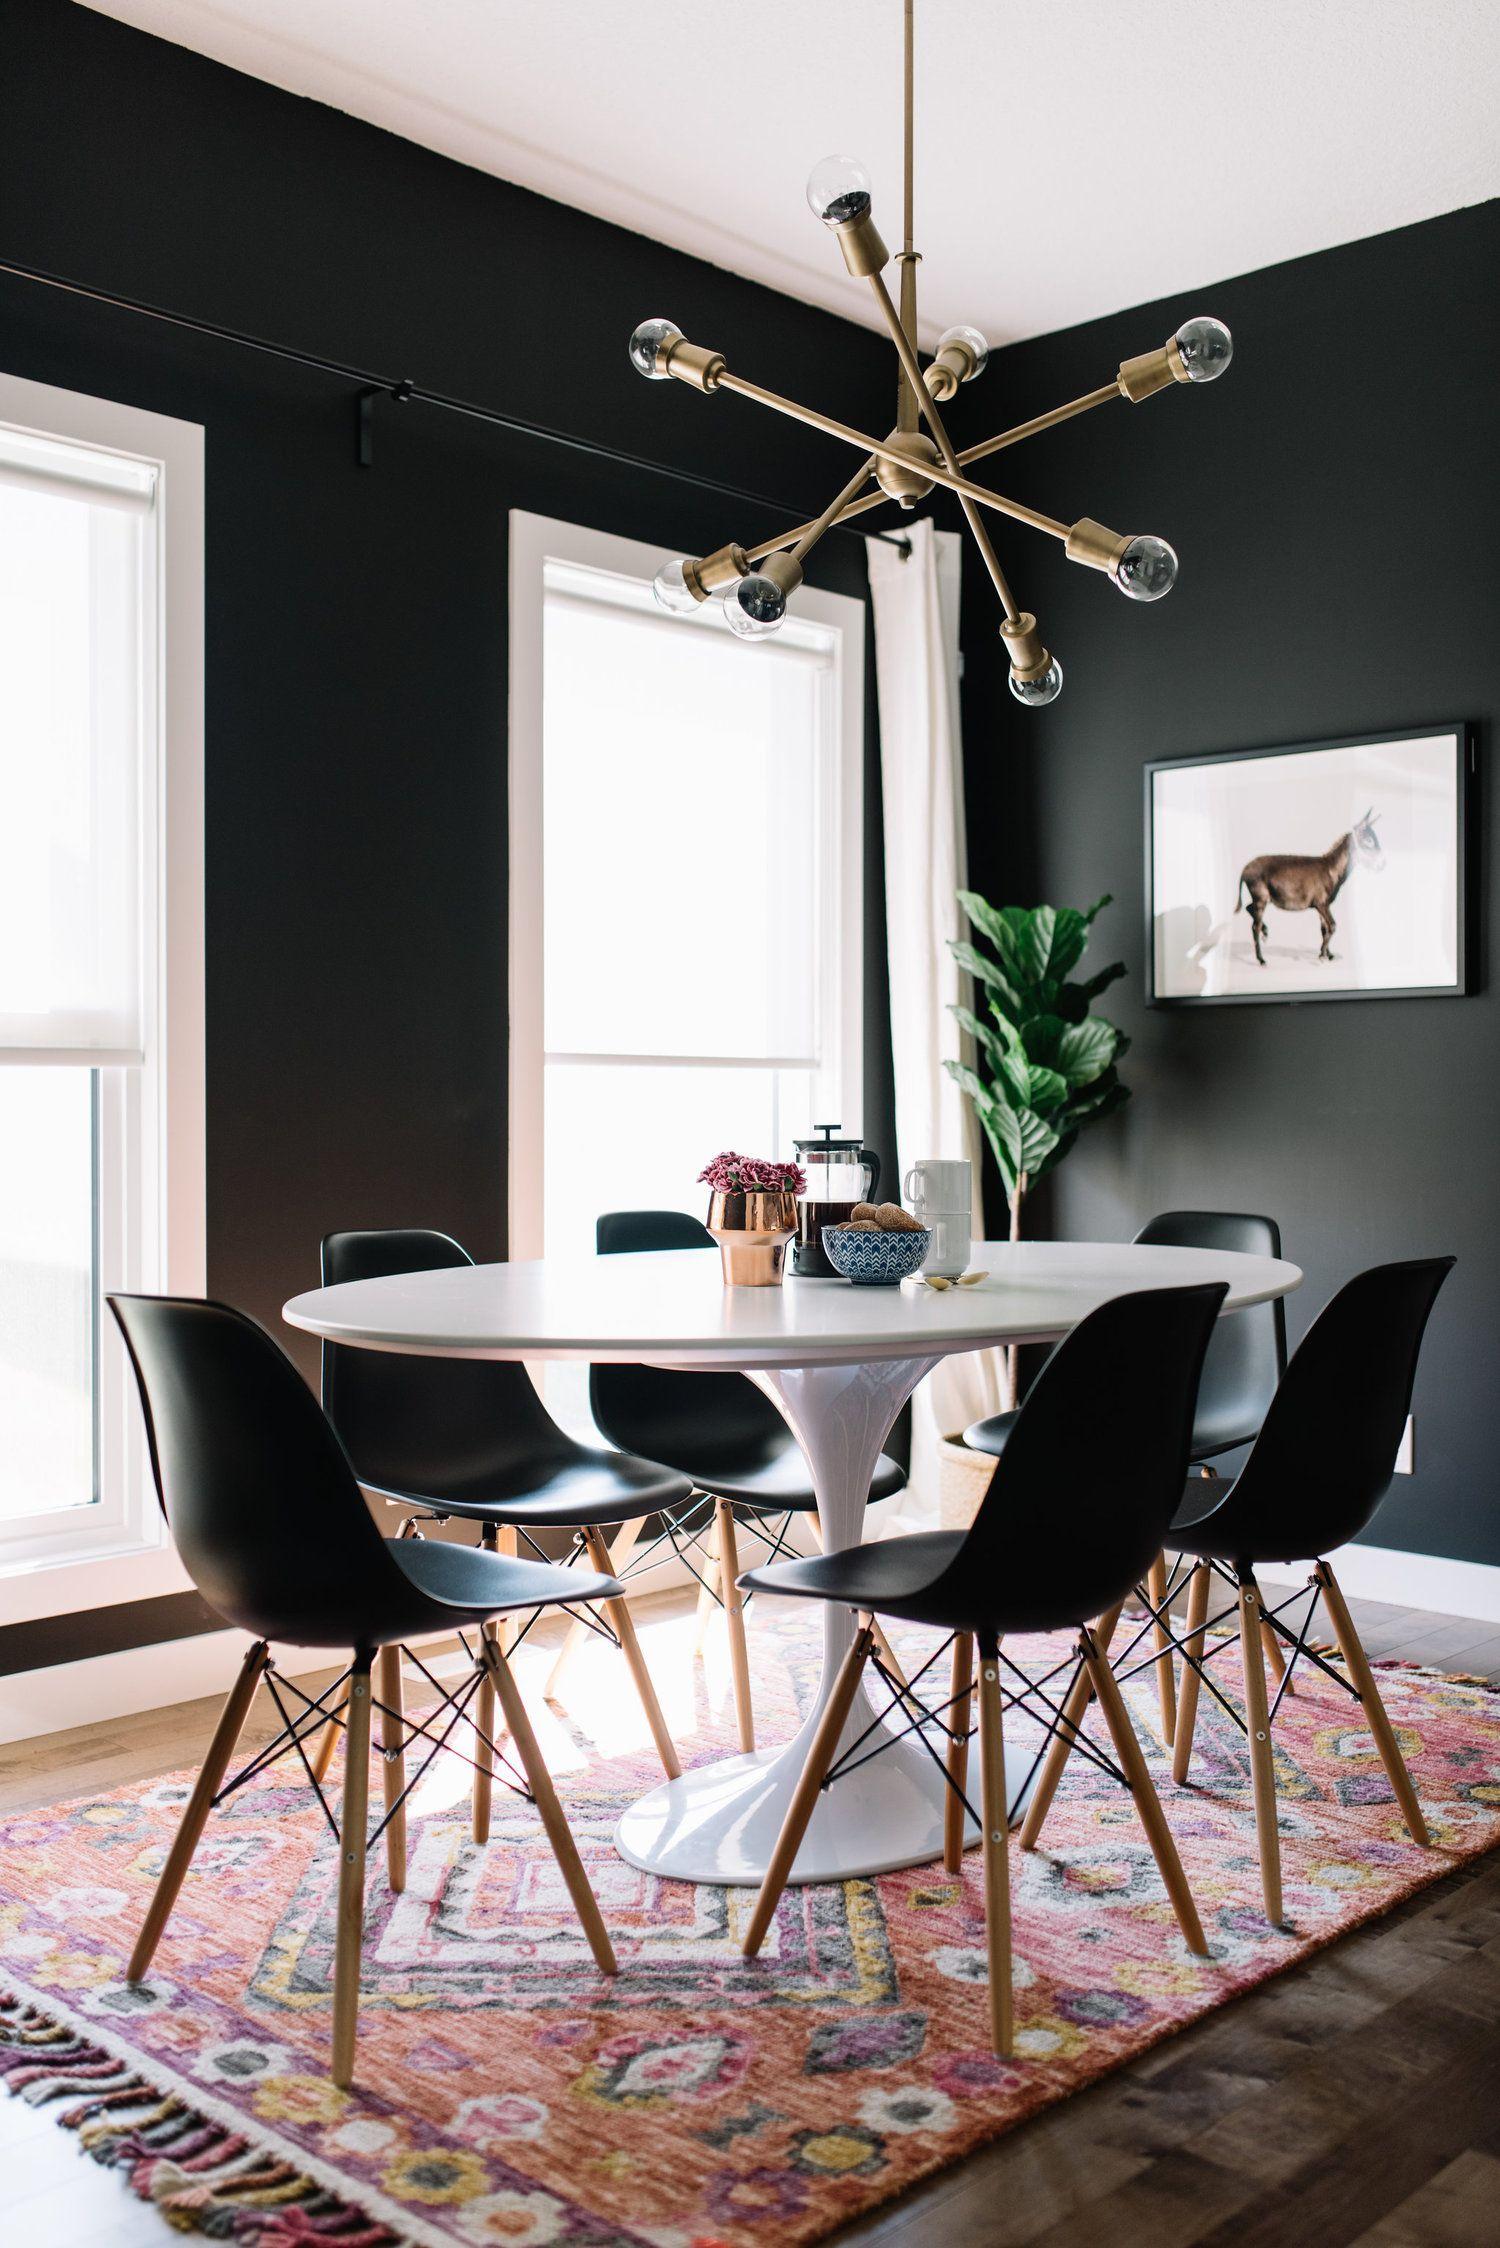 Eclectic Mid Century Modern Dining Room Sovremennaya Stolovaya